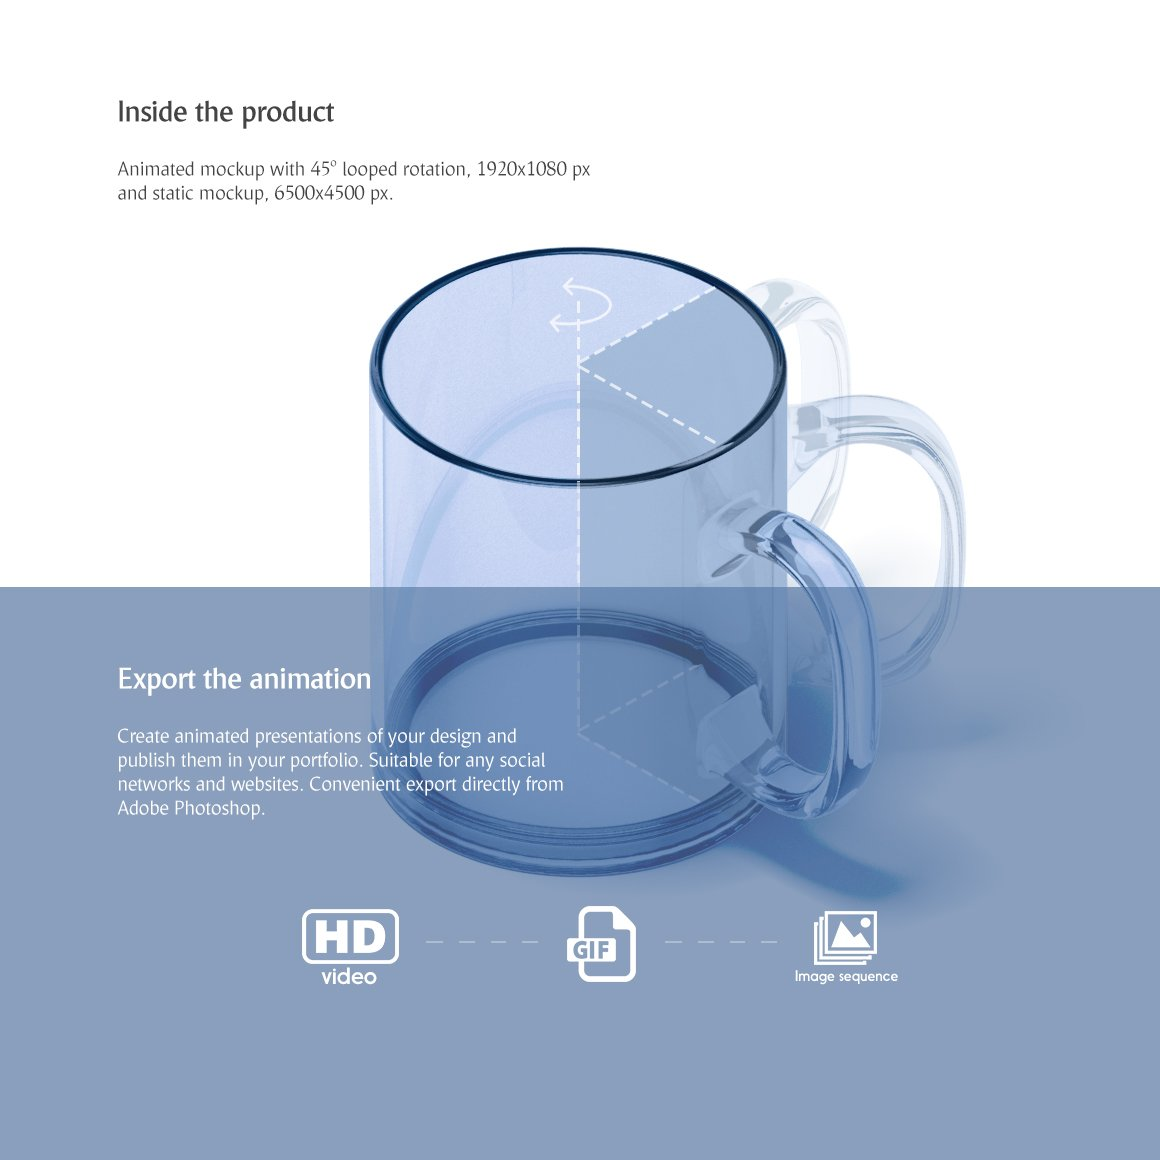 透明玻璃杯设计动态展示样机模板 New Glass Mug Animated Mockup插图(1)